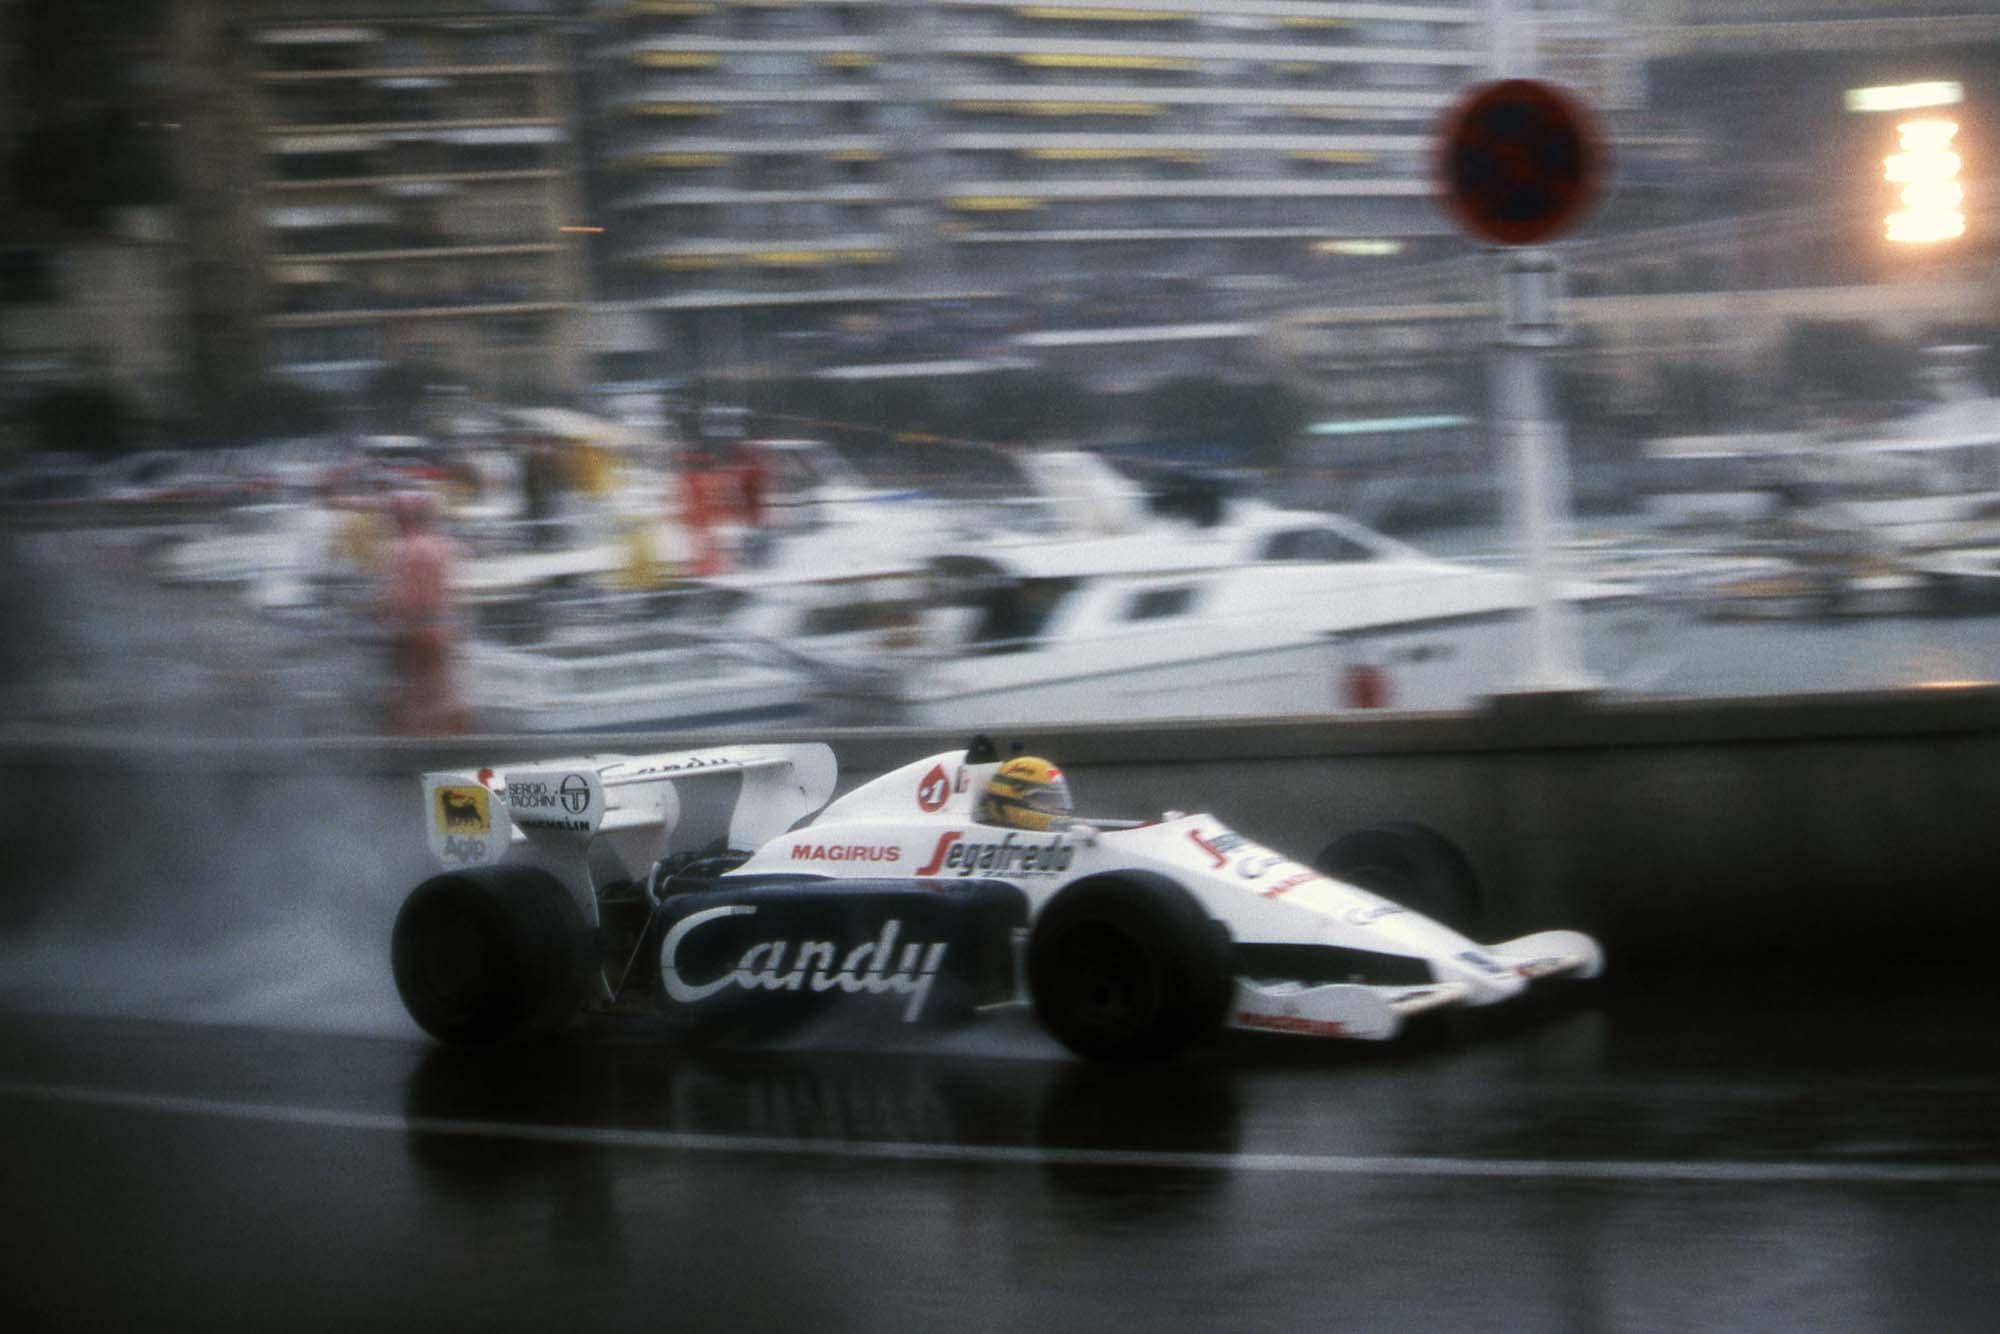 Ayrton Senna threads through the Swimming Pool section at 1984 Monaco GP